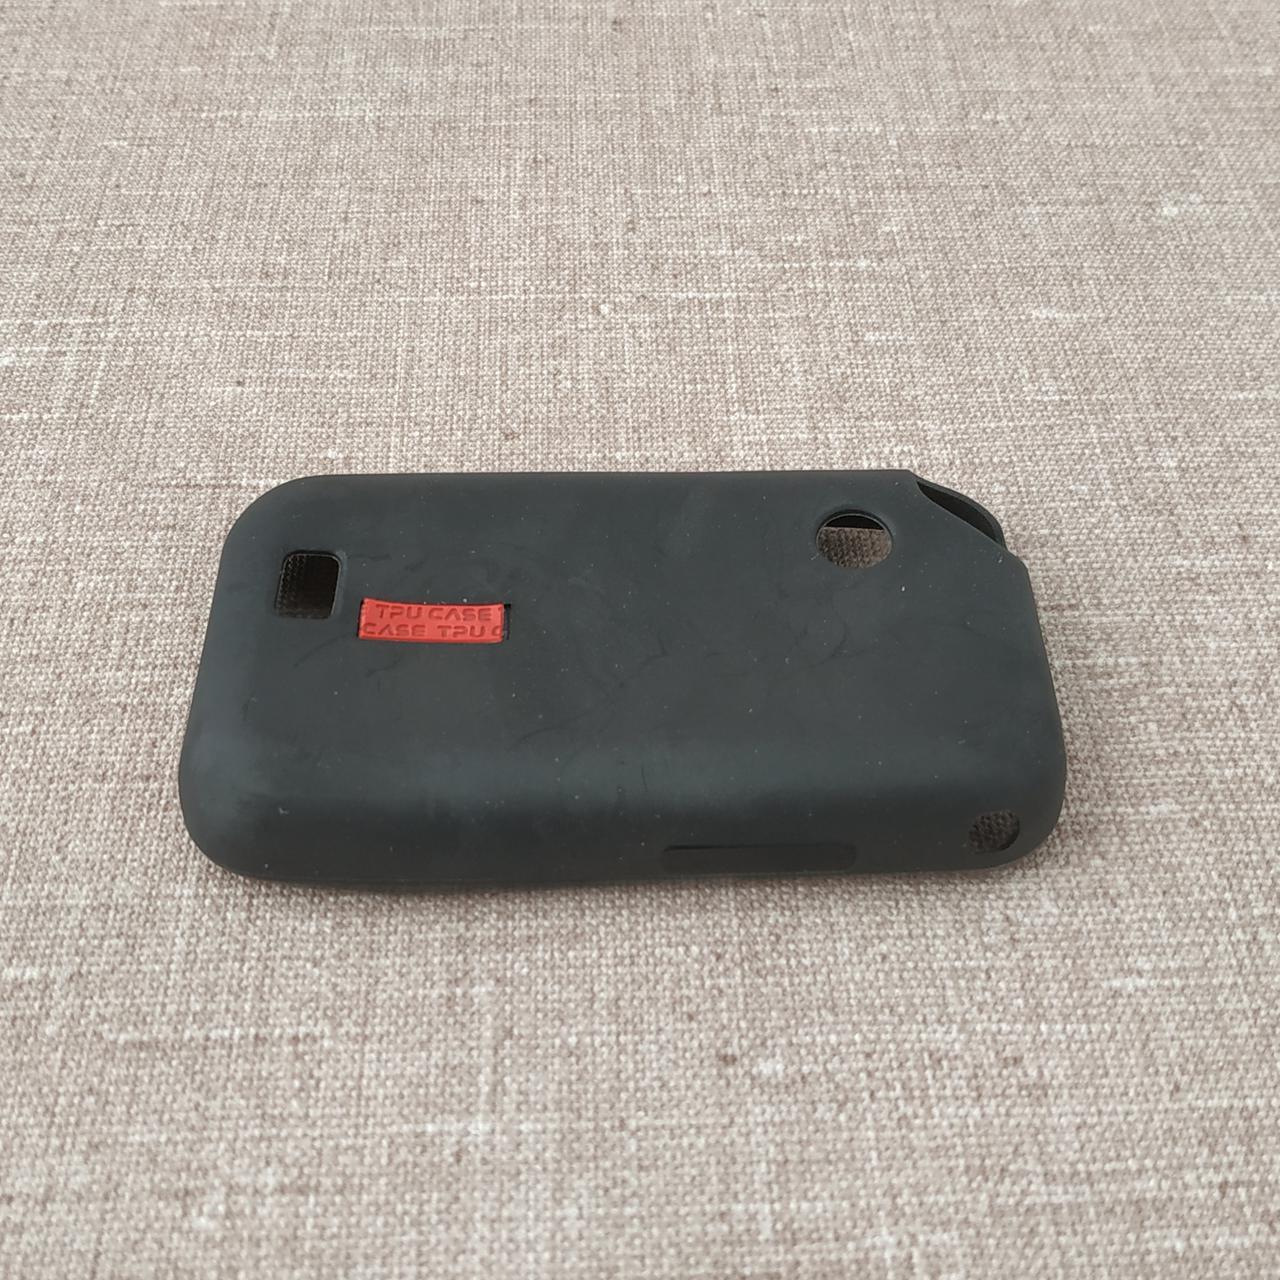 Чехлы для Galaxy других серий Silicon Samsung E2652 black Champ Duos (E2652) Для телефона